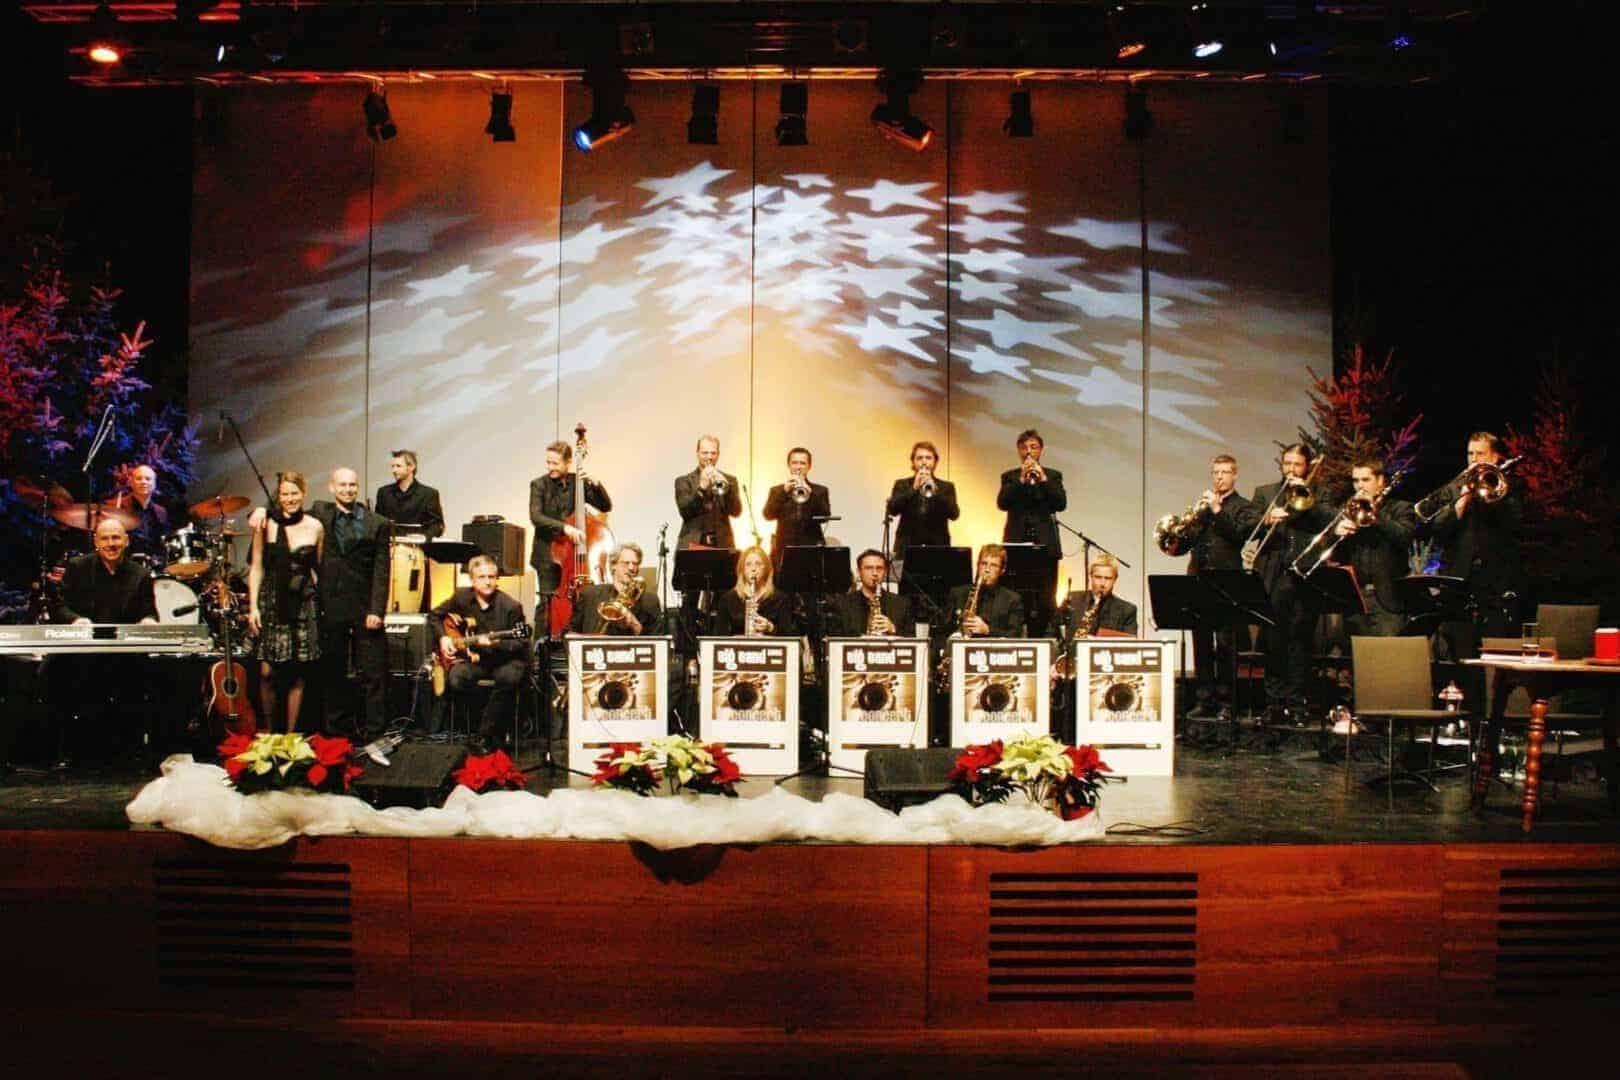 Konzert: Swinging Christmas mit der Big Band 2000